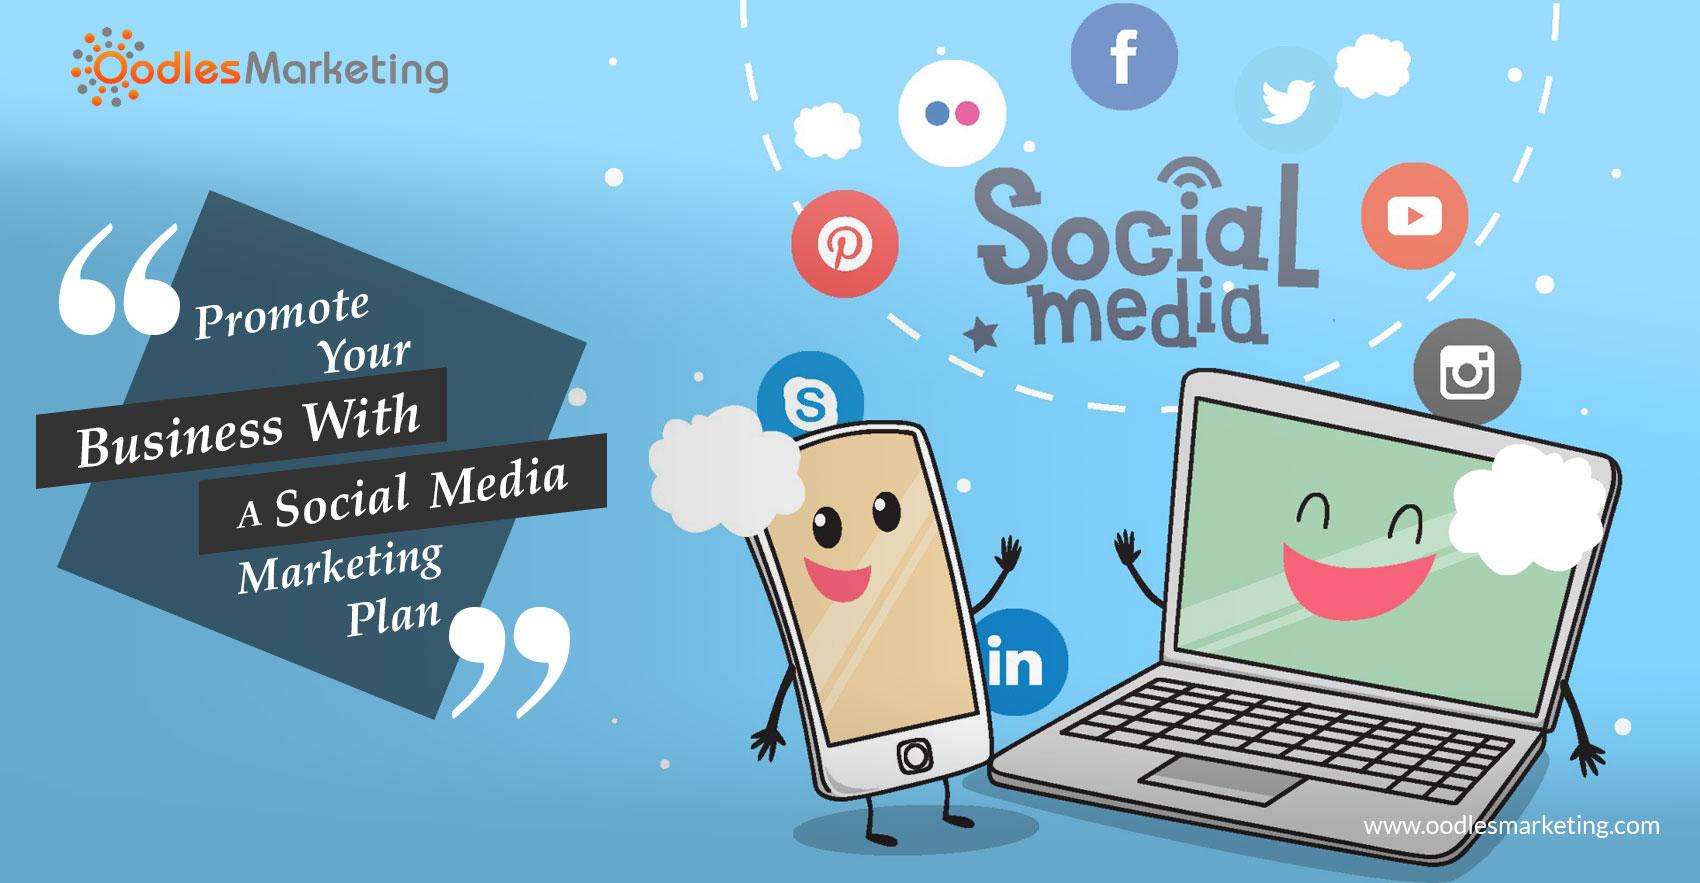 An influential Social media marketing plan